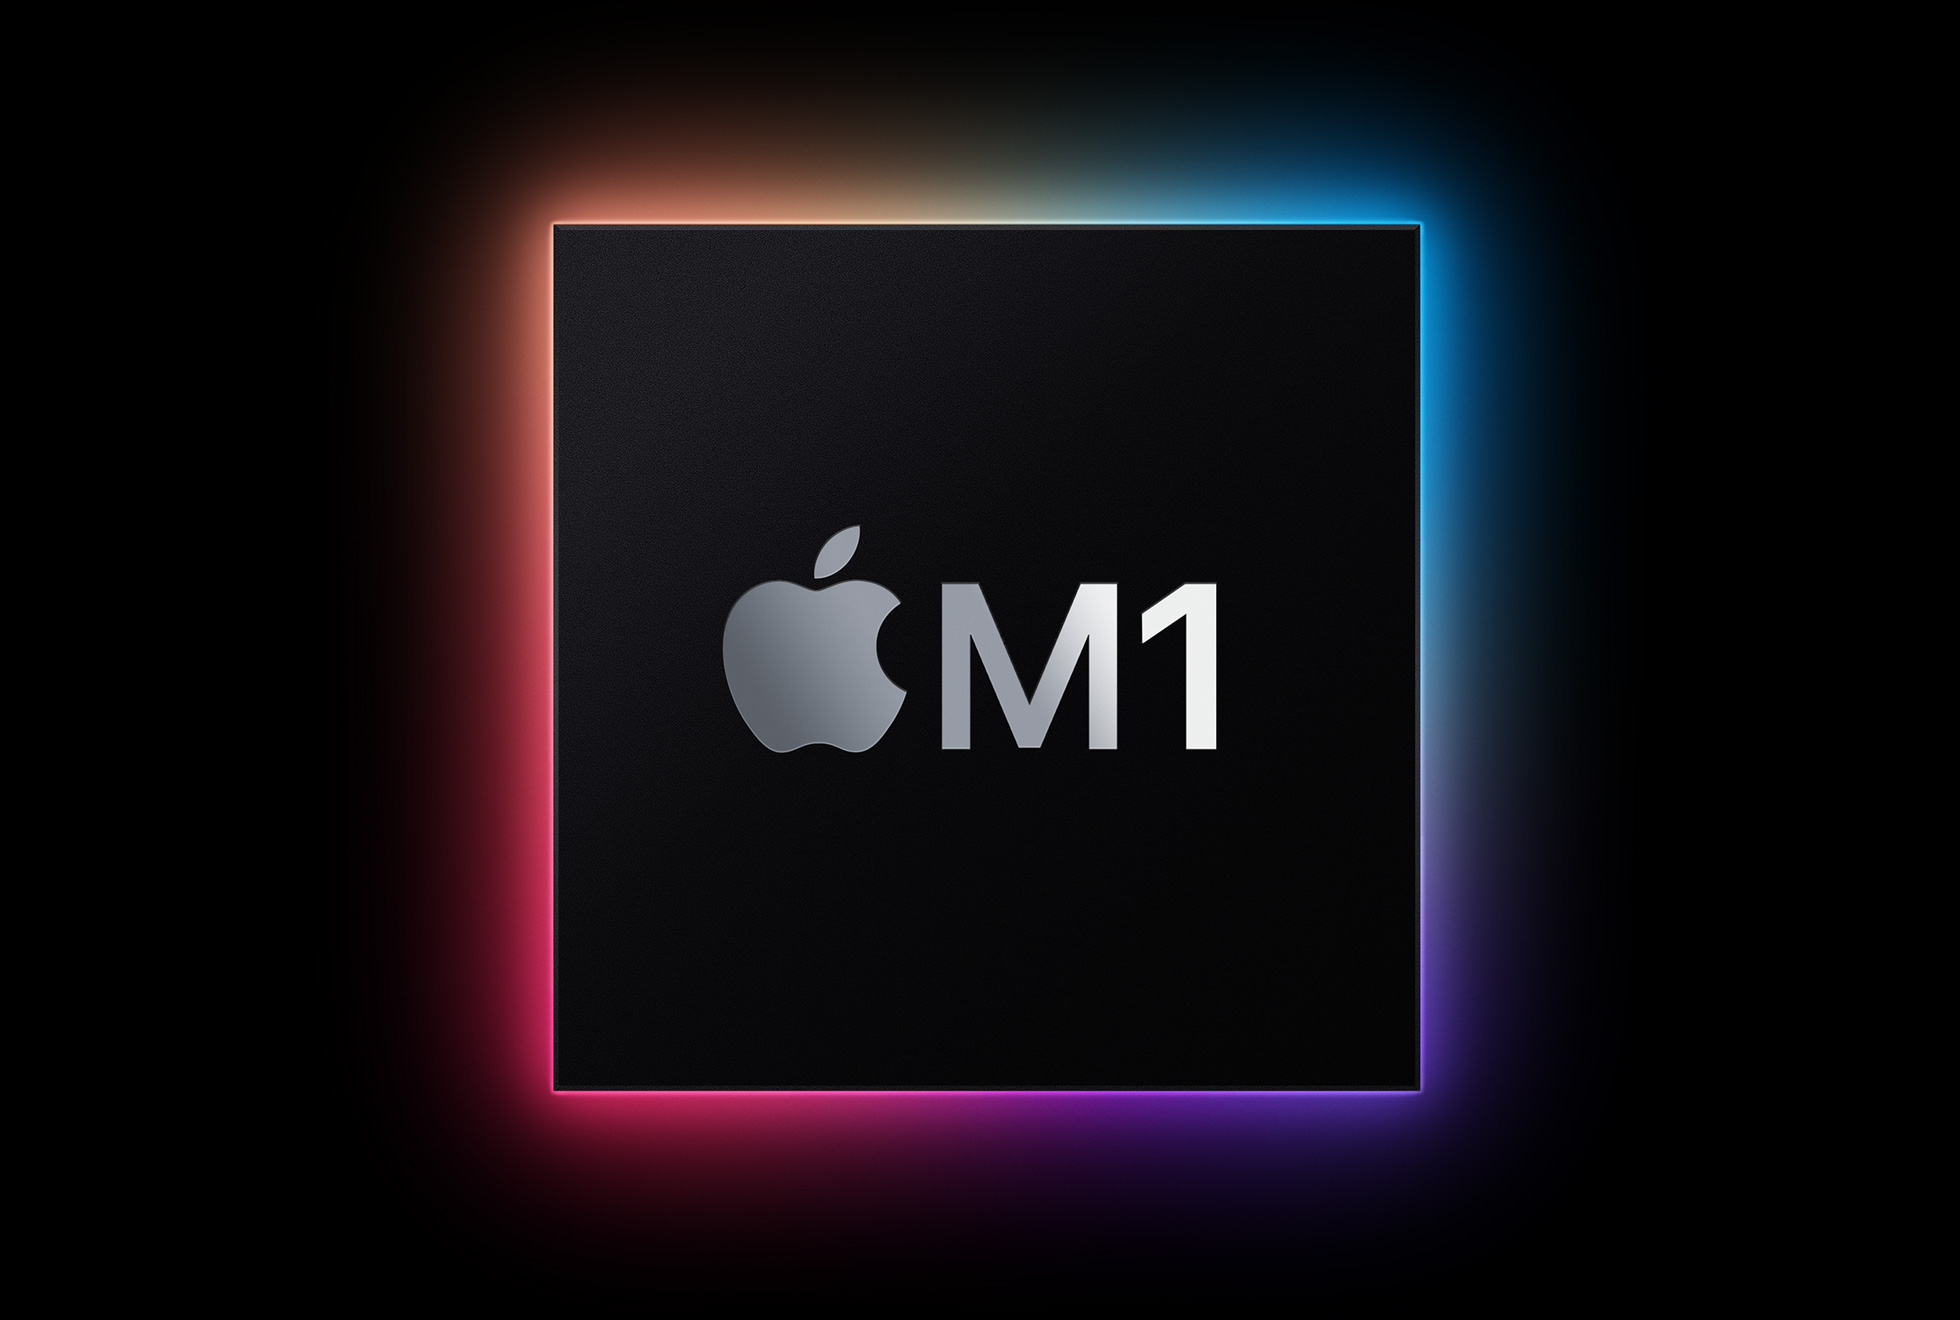 Apple_new-m1-chip-graphic_11102020.jpg